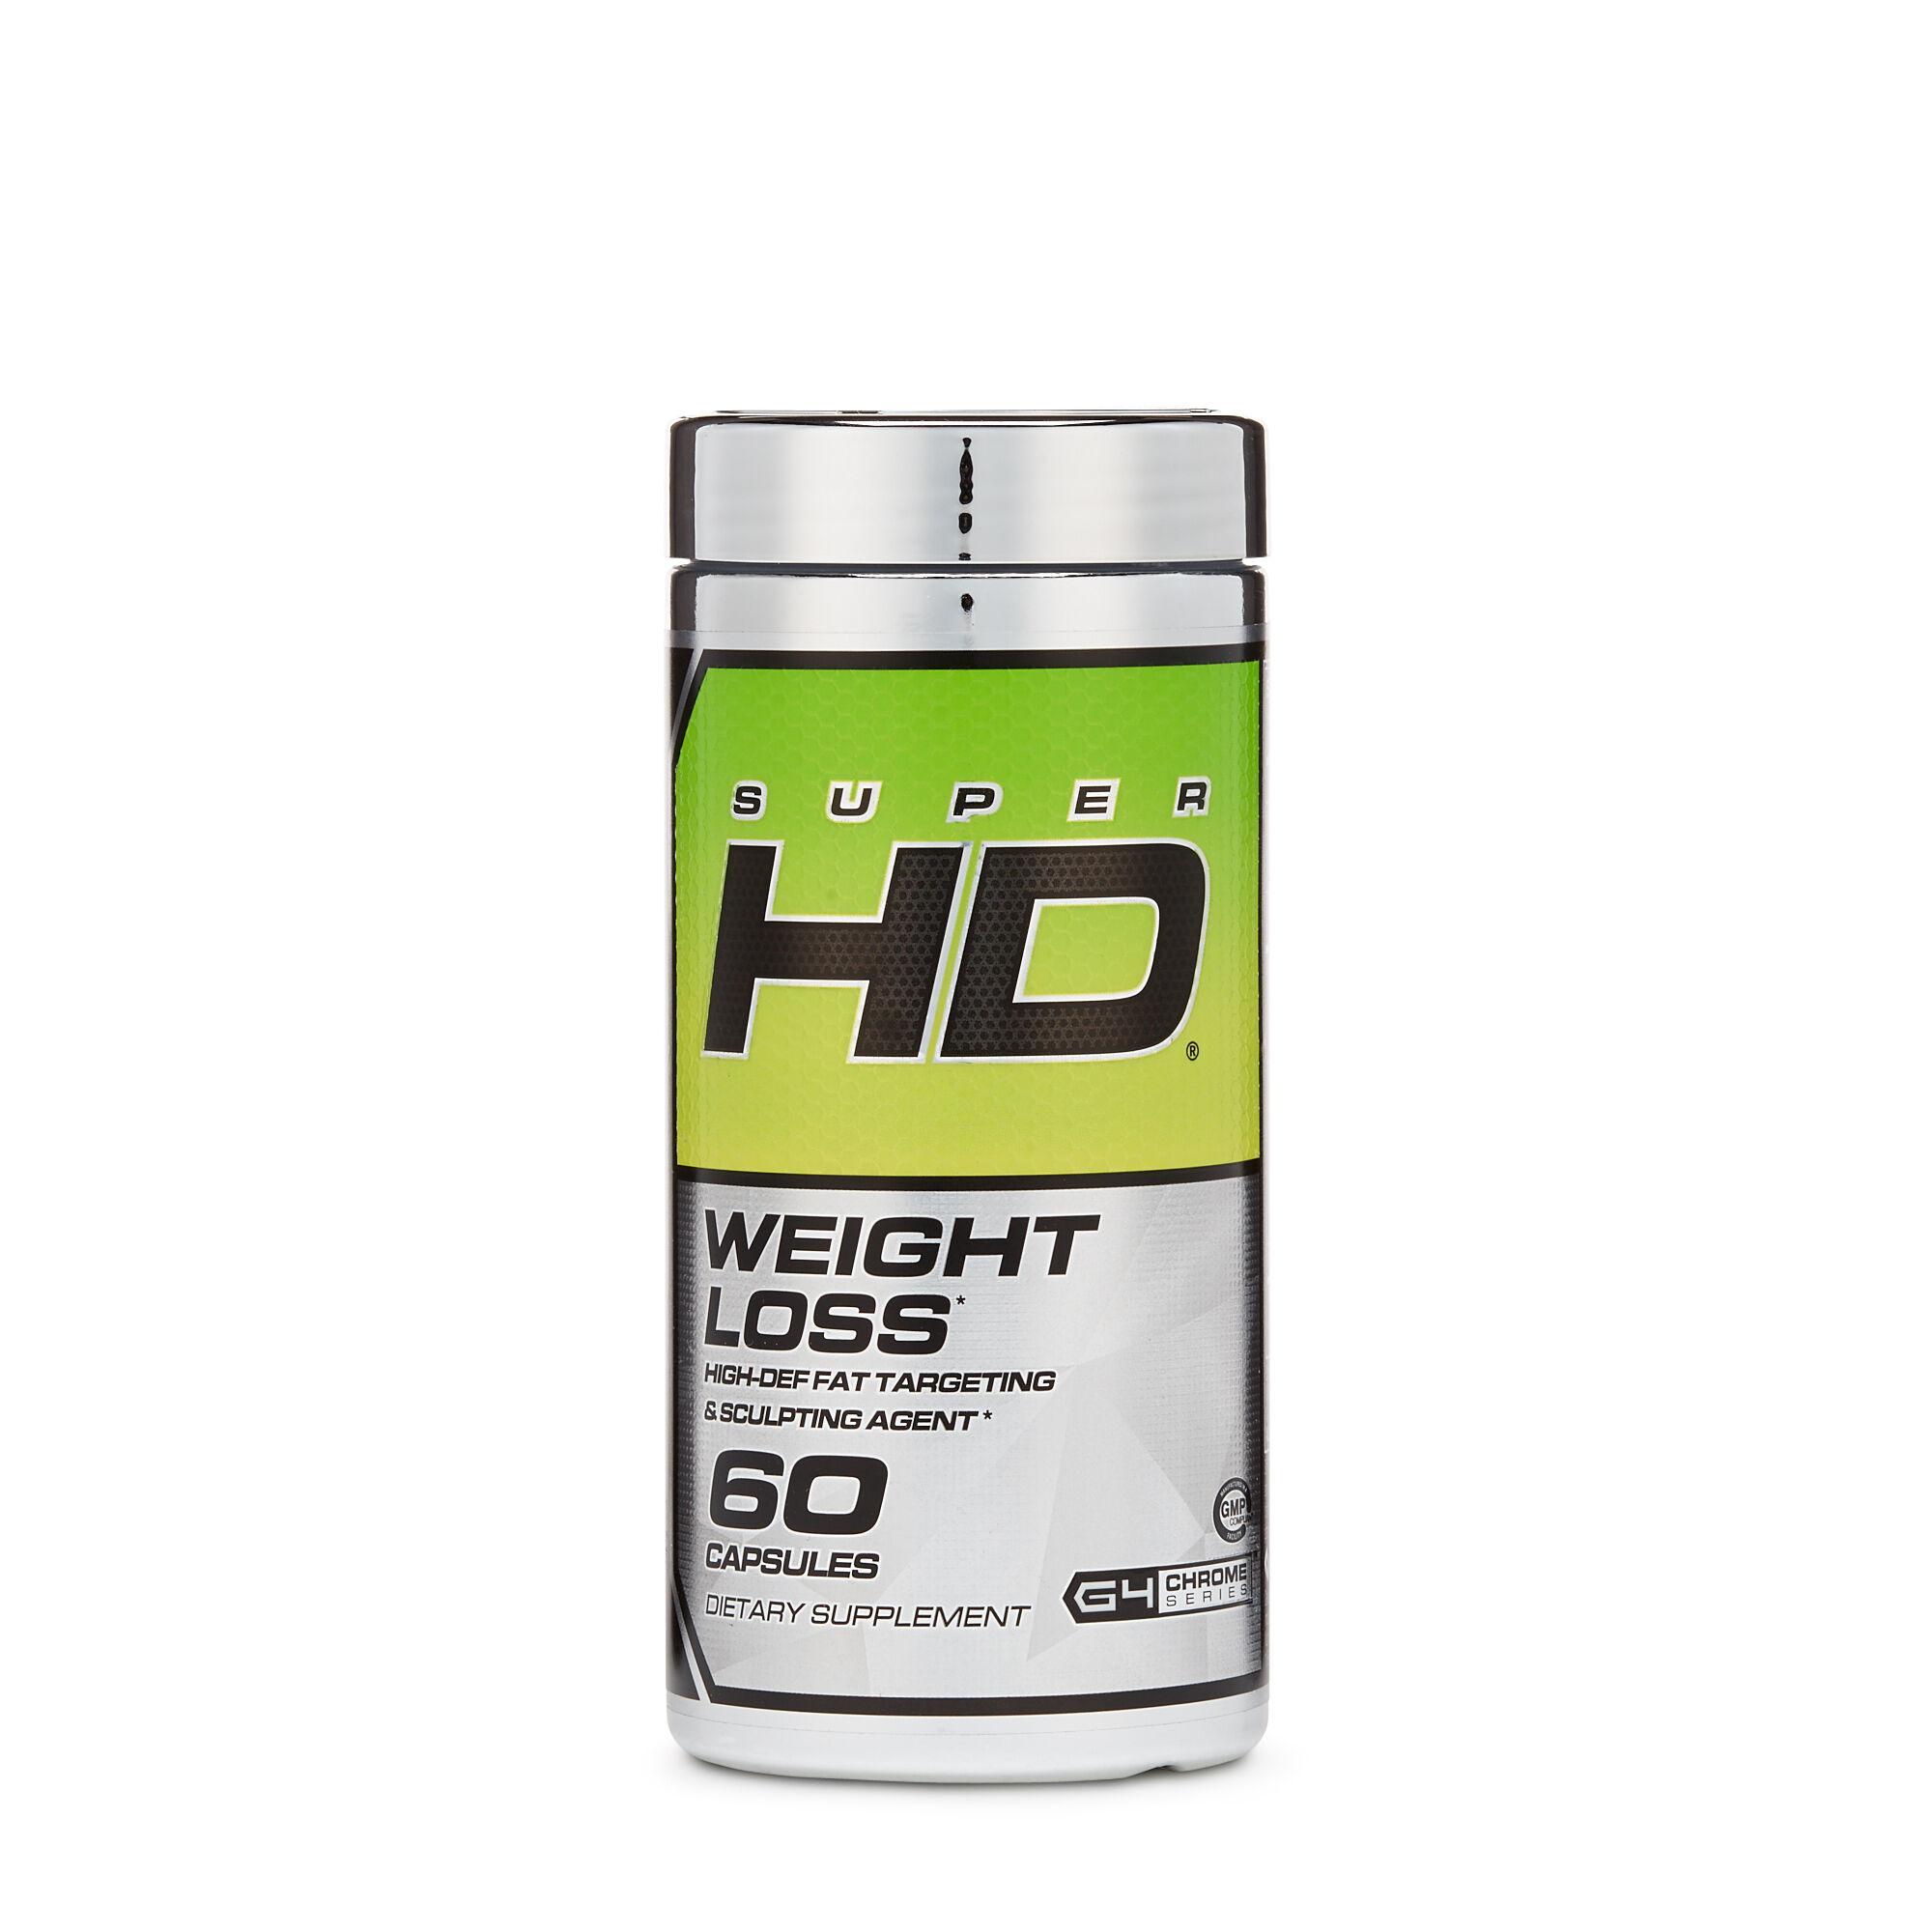 Hd weight loss powder gnc